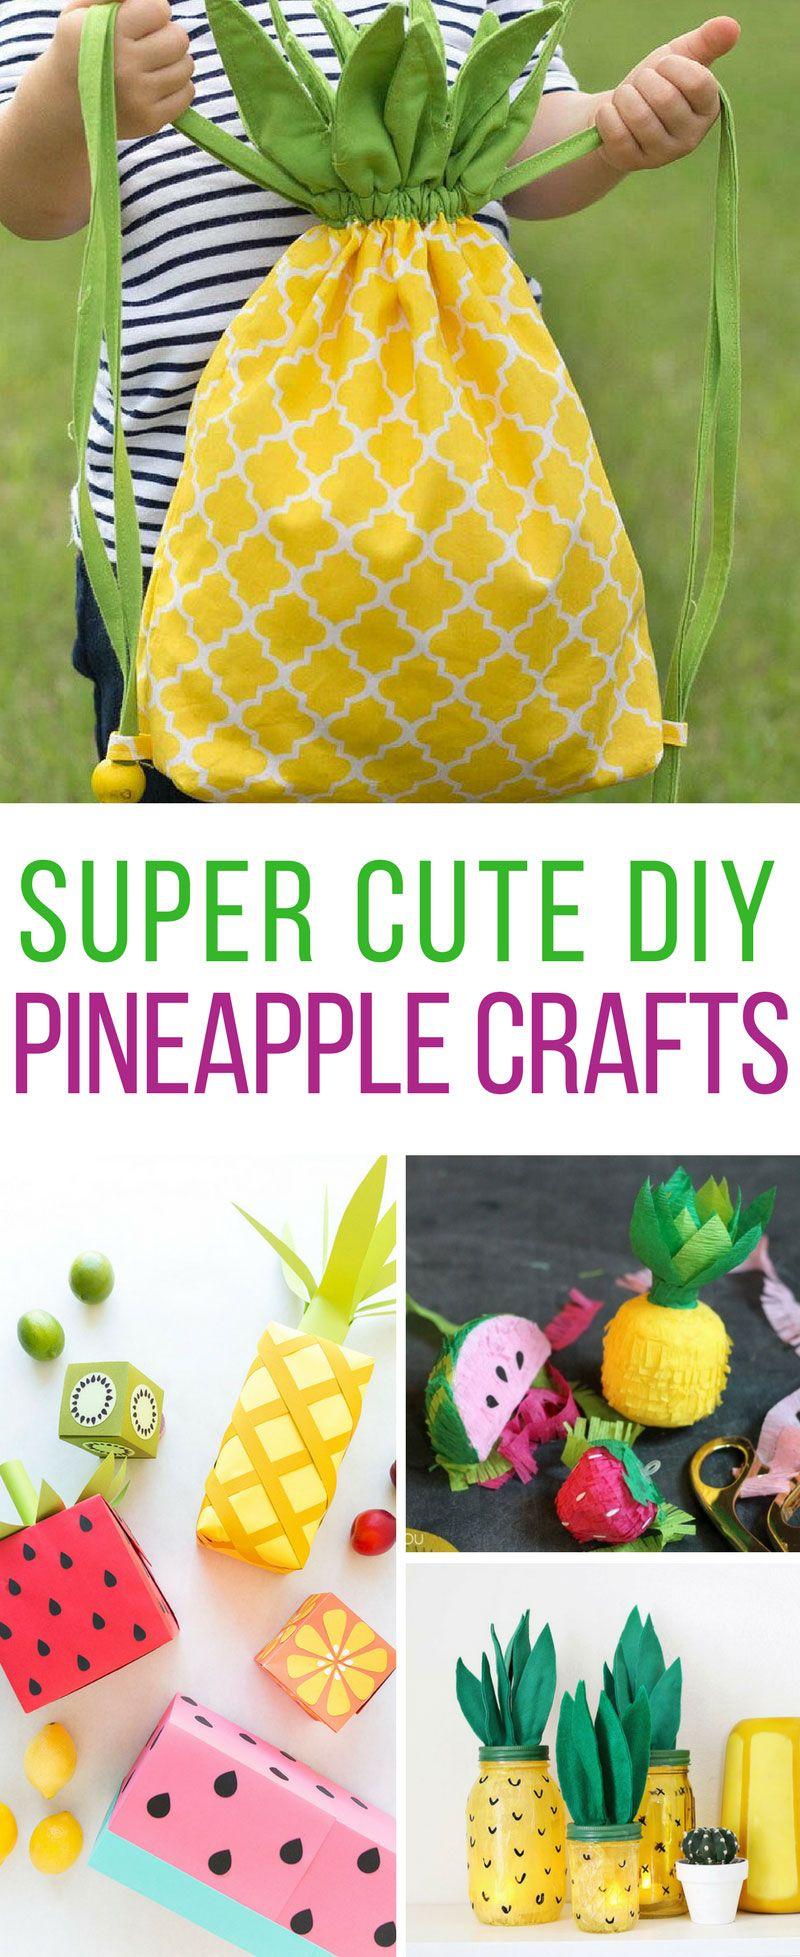 32 Stunning Diy Pineapple Crafts To Brighten Your Day Diy